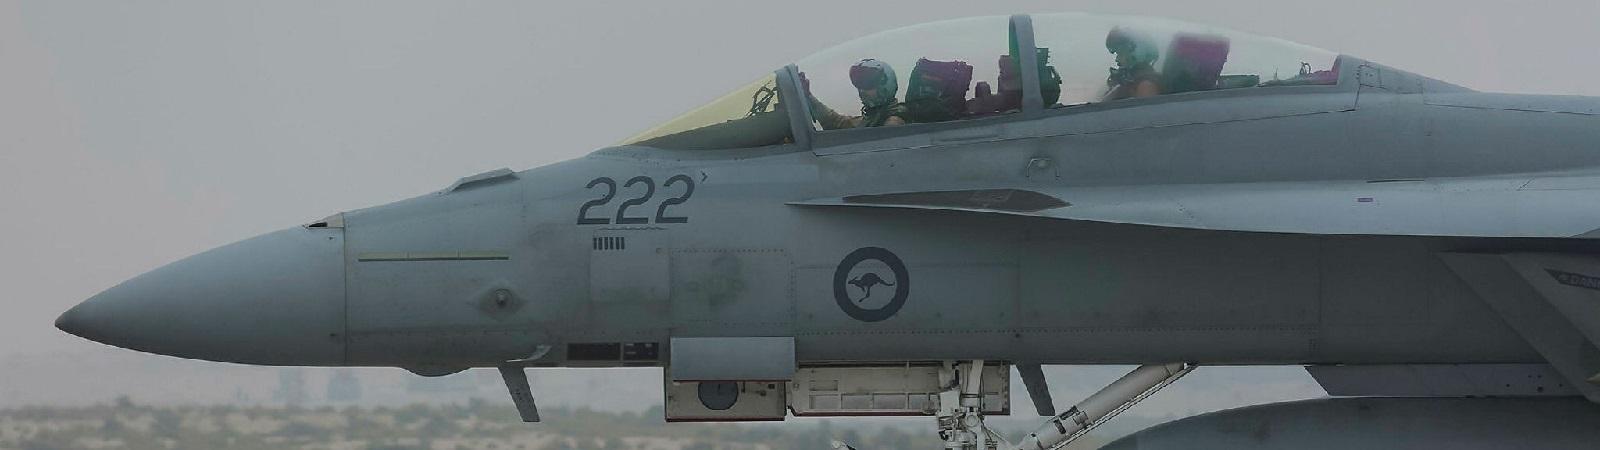 An RAAF F/A-18A Hornet aircraft (Photo: Aust Defence Image Library)